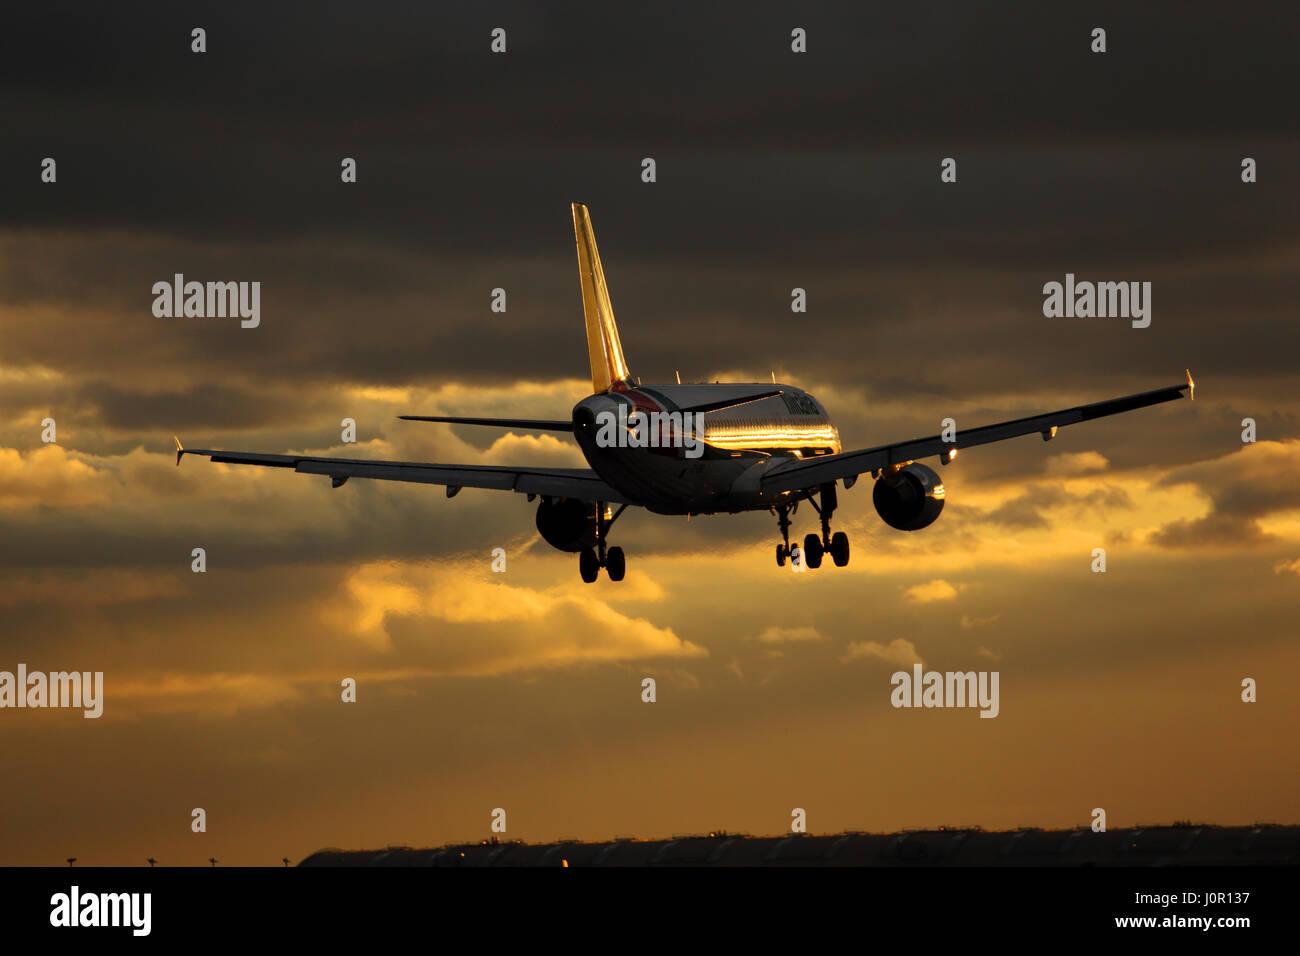 EI-EIB Alitalia Airbus A320-200 cn 4249 Landing at London Heathrow airport at sunset - Stock Image